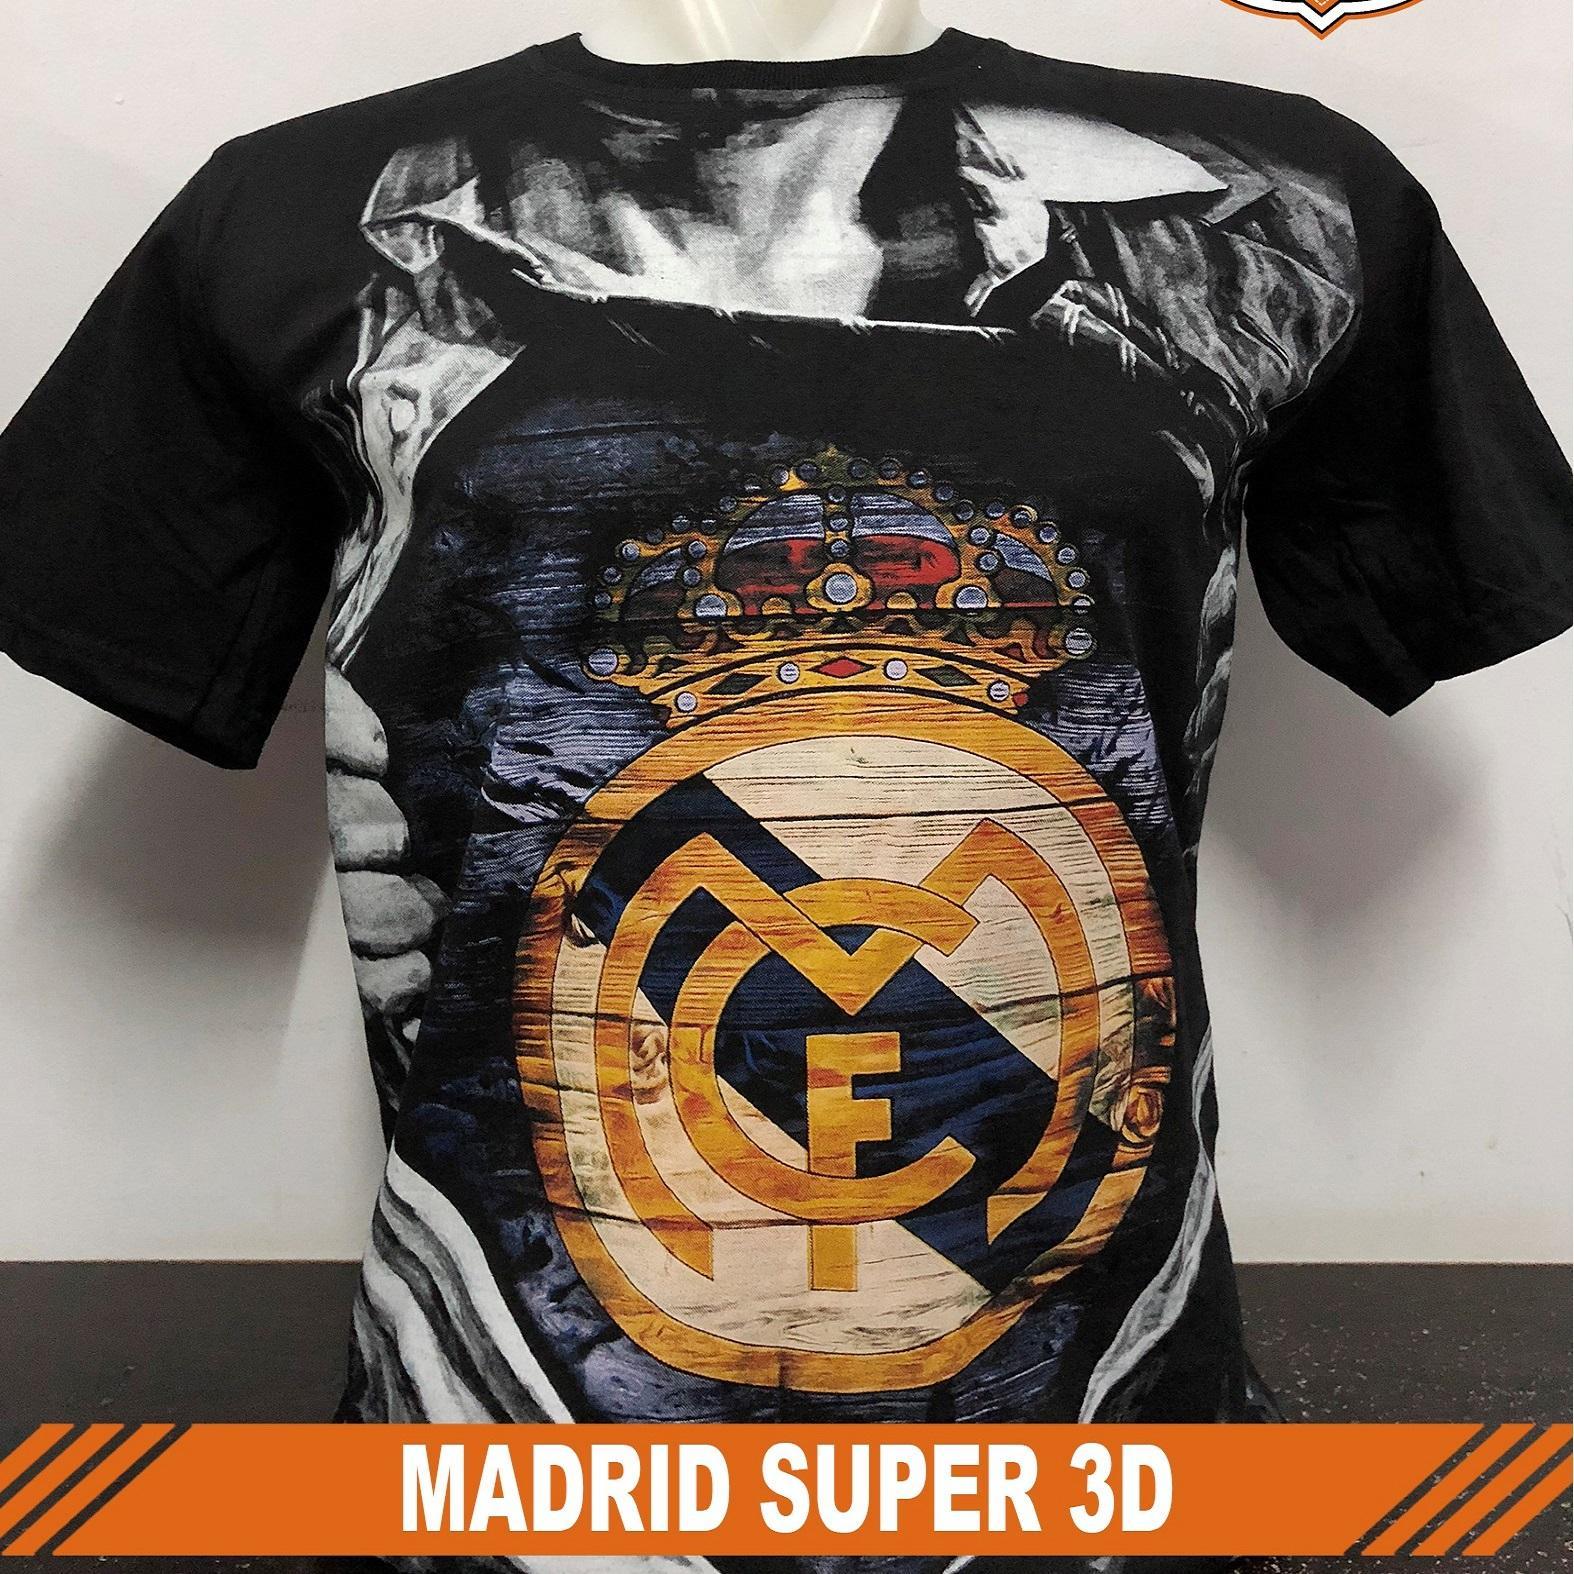 Harga Kaos Real Madrid Jershirt Hitam Baju Distro Oblong Jersey Jasminesalsabila T Shirt Klub Bola Super